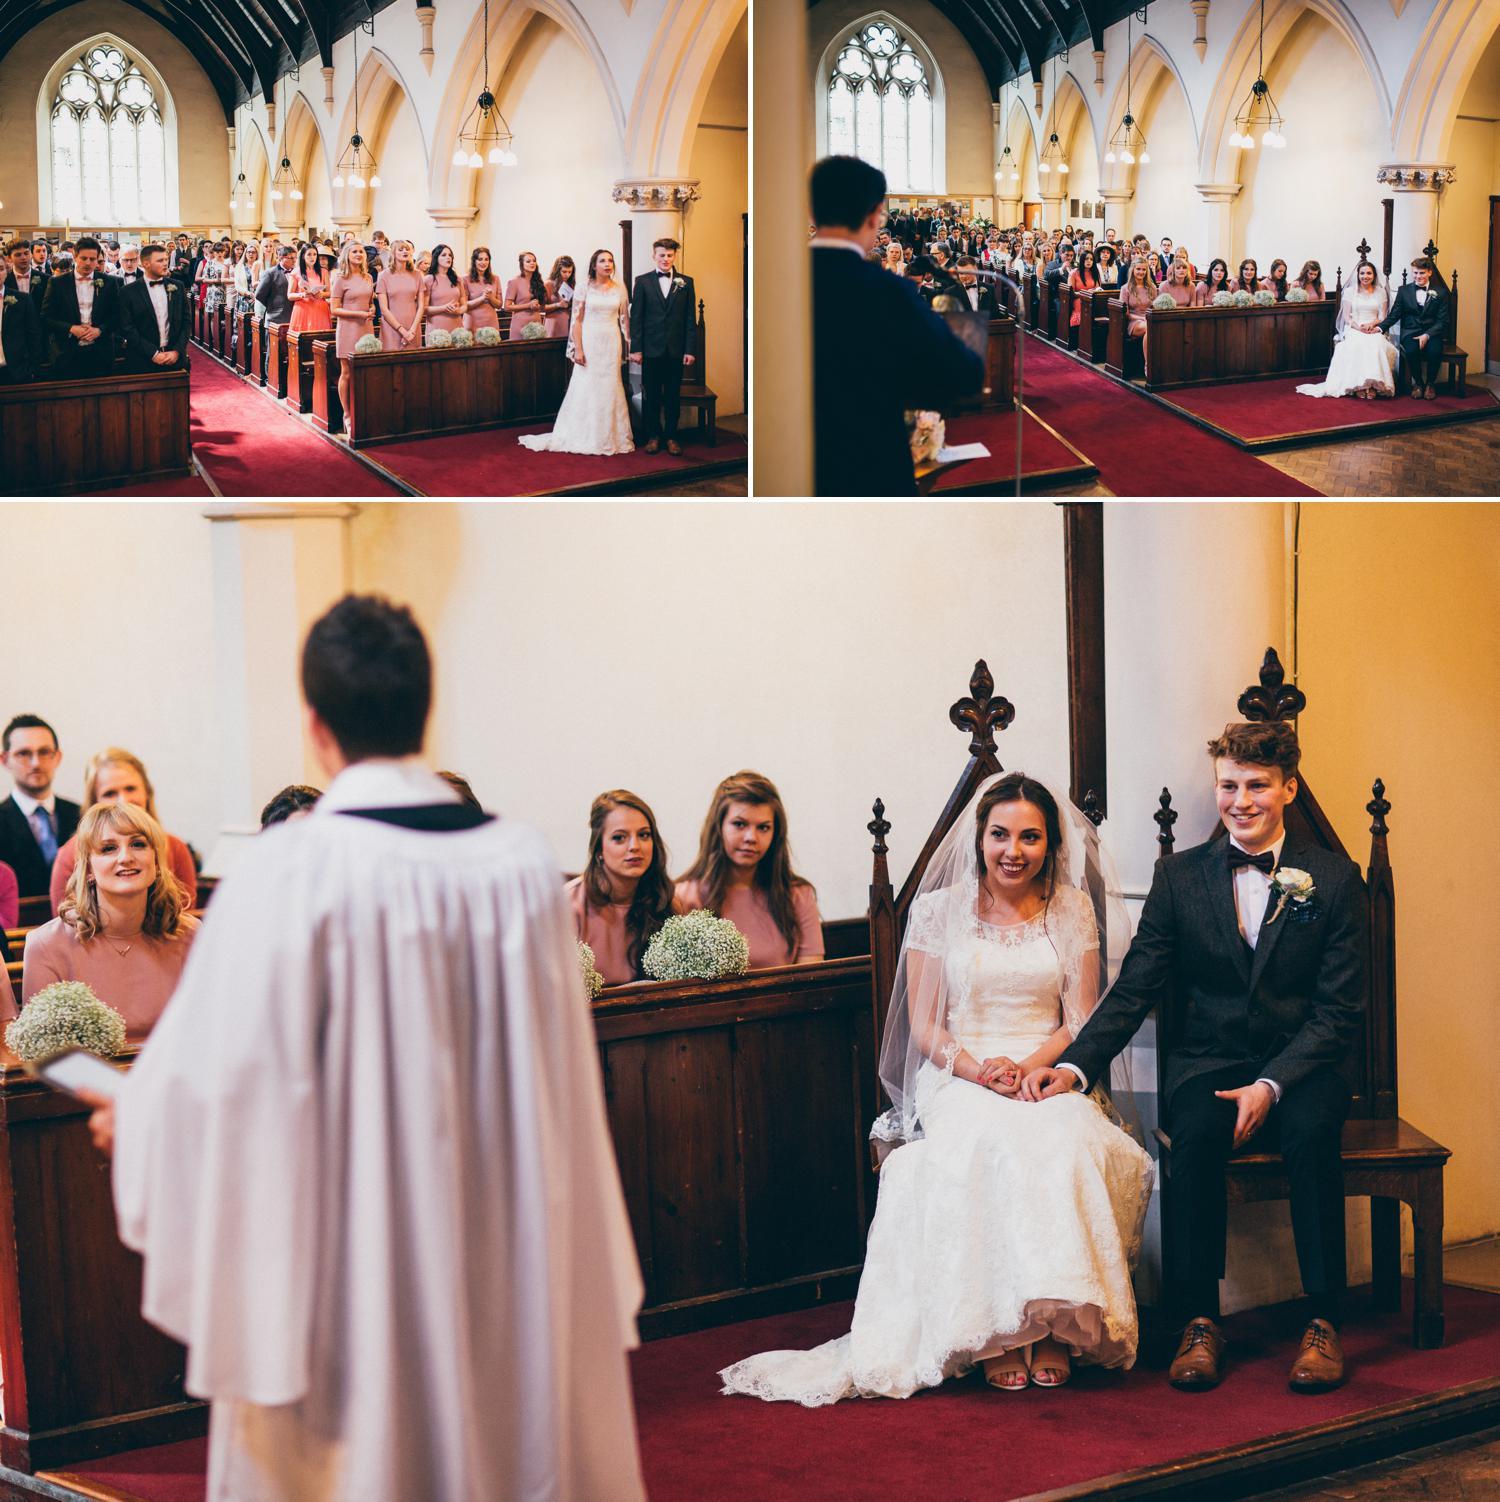 112-st-andrews-watford-wedding.jpg